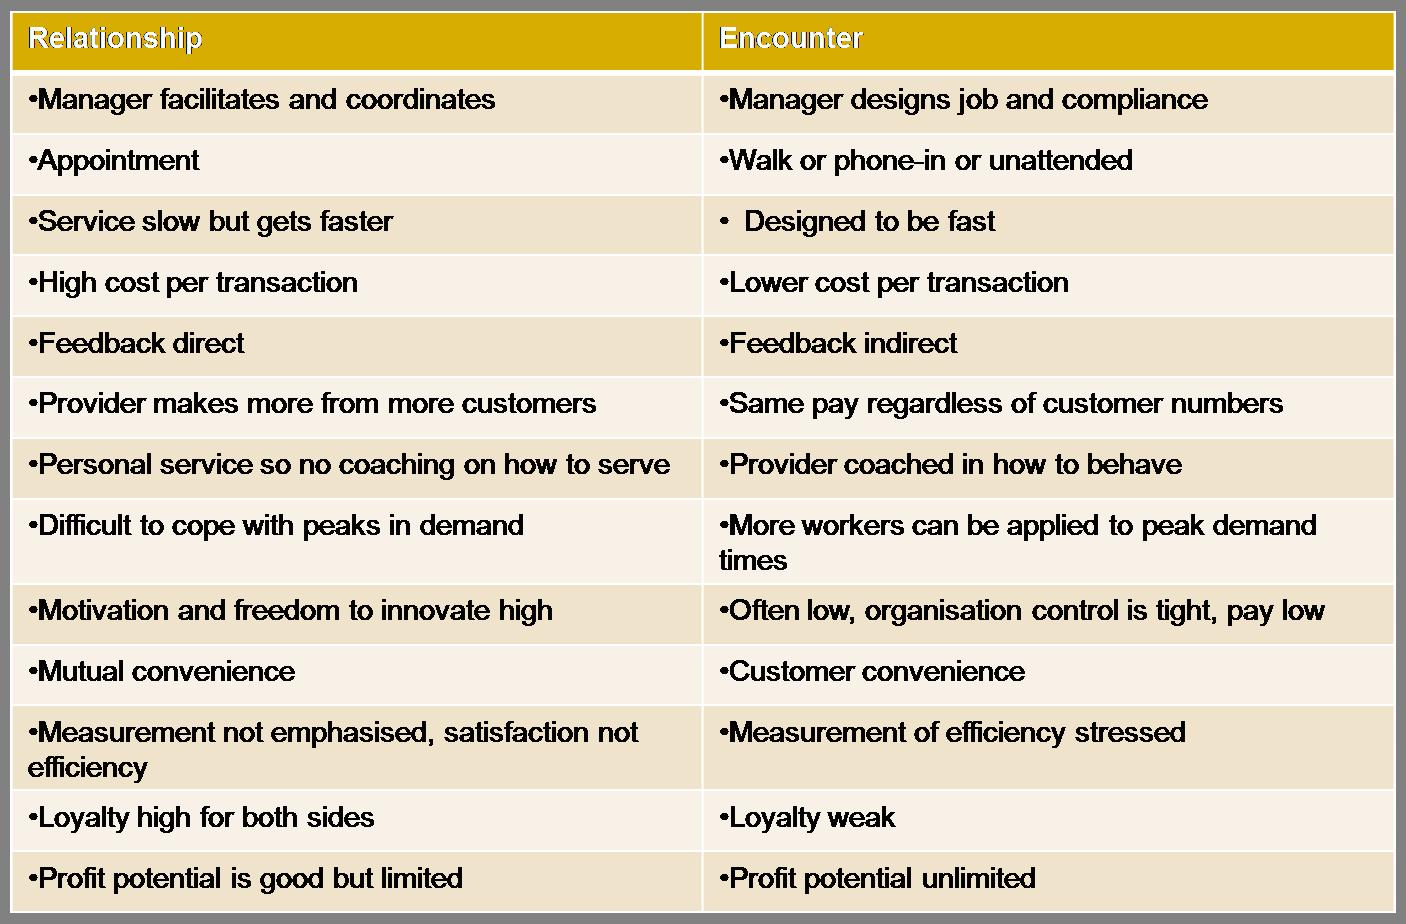 relationship-vs-encounter